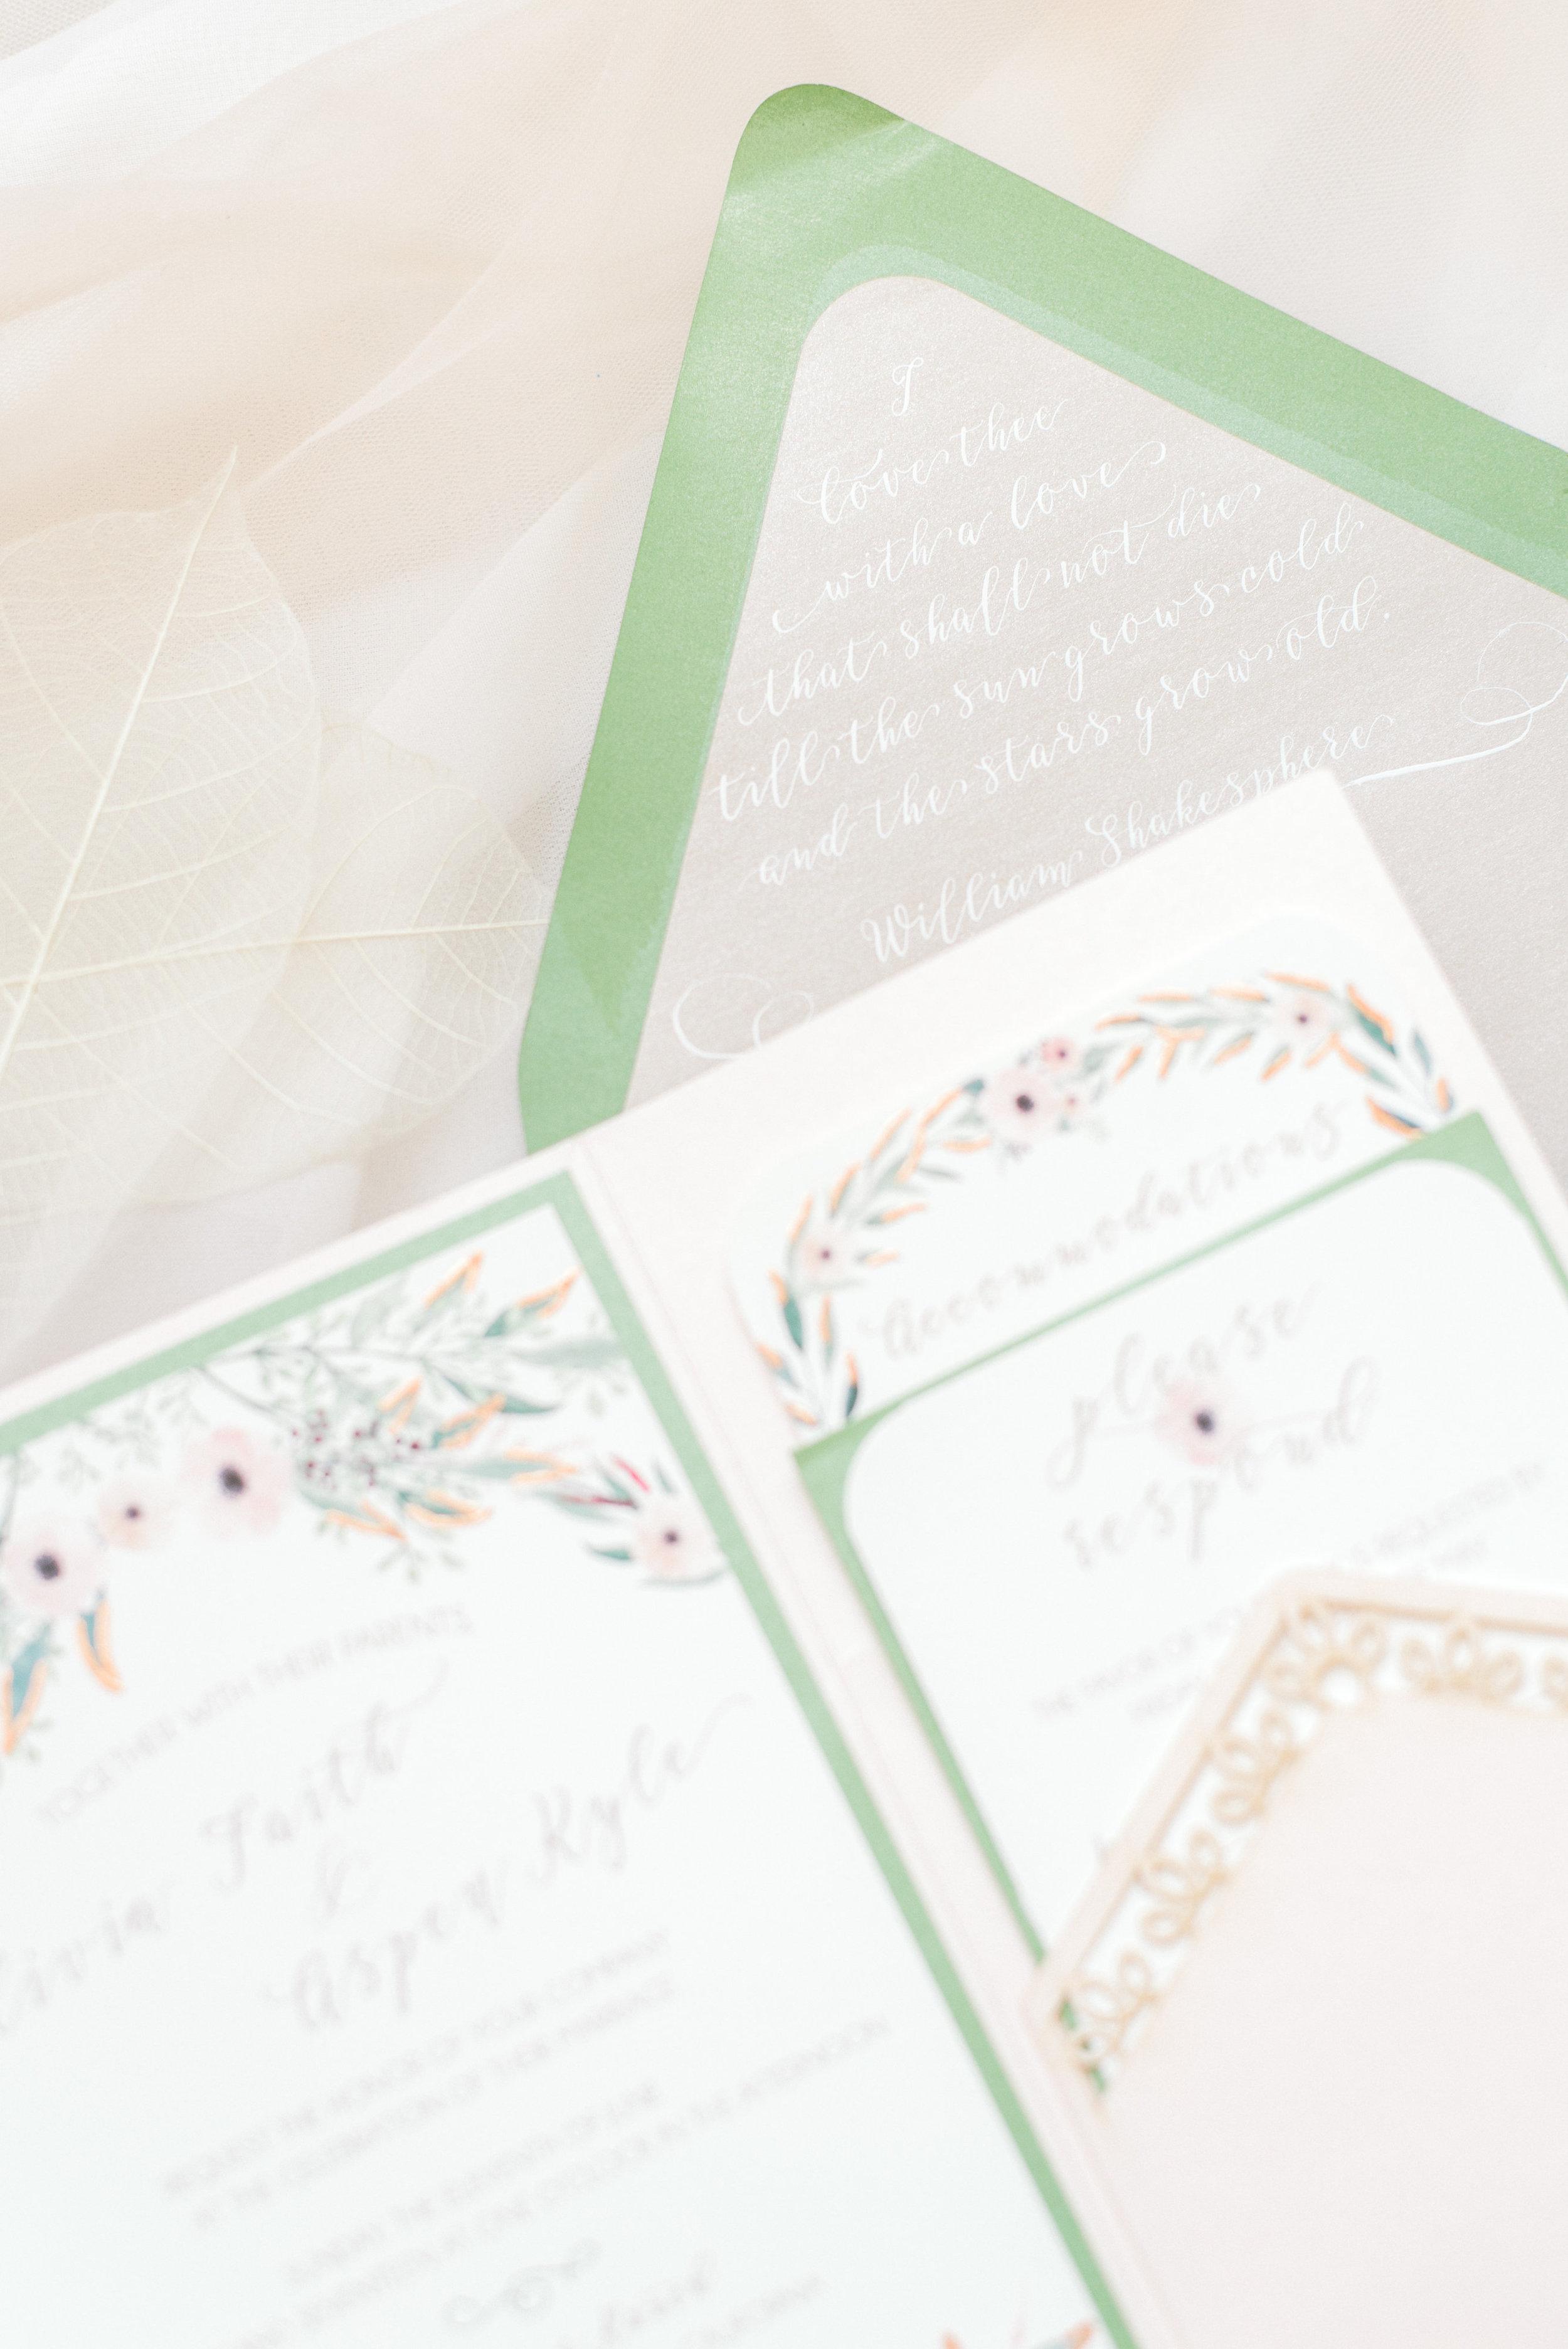 Peach Gold-Central PA, York PA, JesSmith Designs, custom, wedding, invitations, bridal, announcements, save the date, baby, hanover, calligraphy, baltimore, wedding invitations, lancaster, gettysburg63.jpg